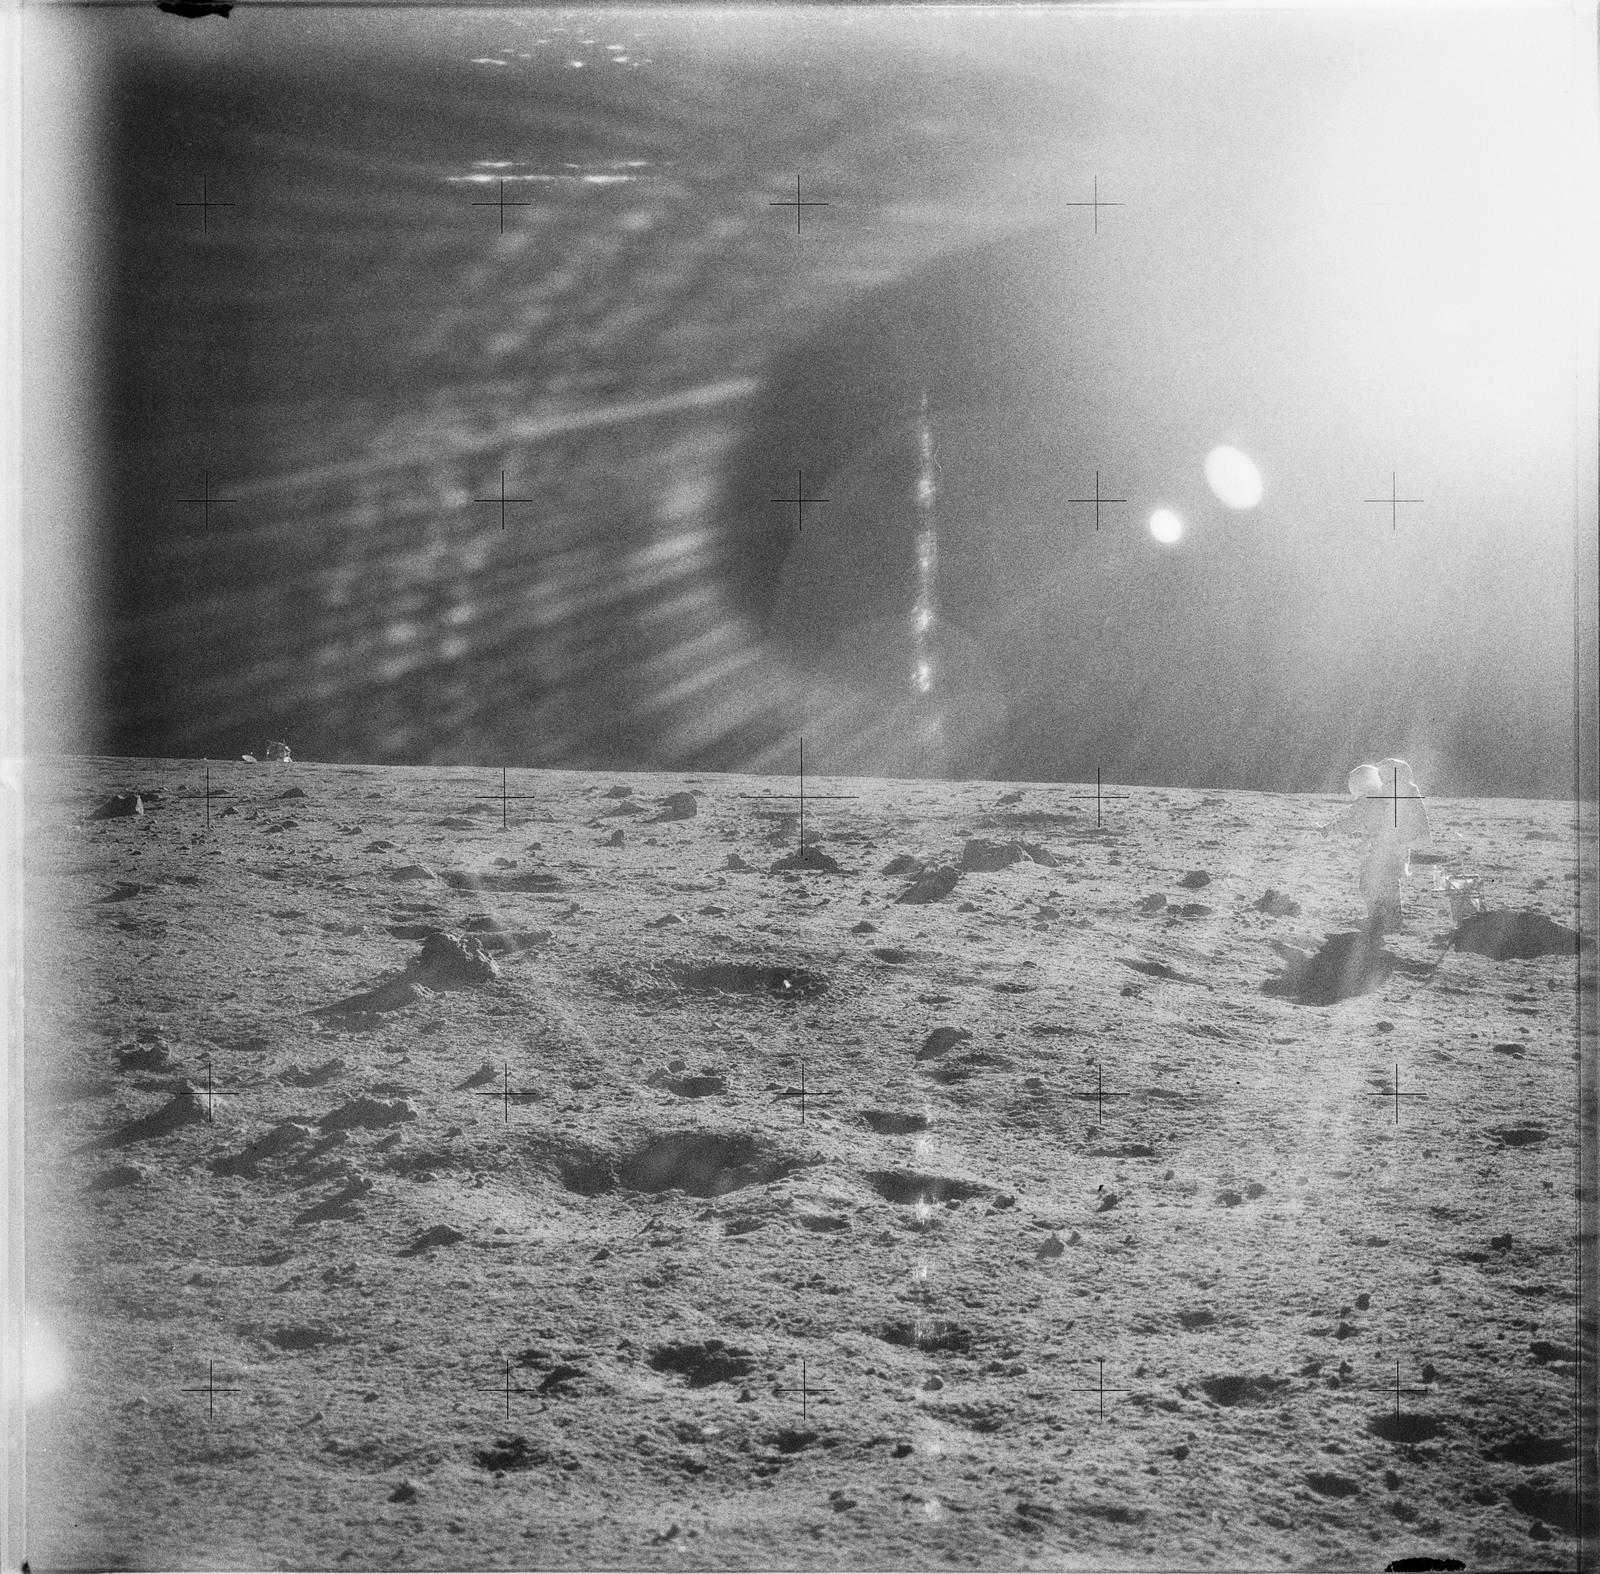 AS12-49-7246 - Apollo 12 - Apollo 12 Mission image  - Astronaut Alan L. Bean, lunar module pilot, is photographed on the Lunar terrain.